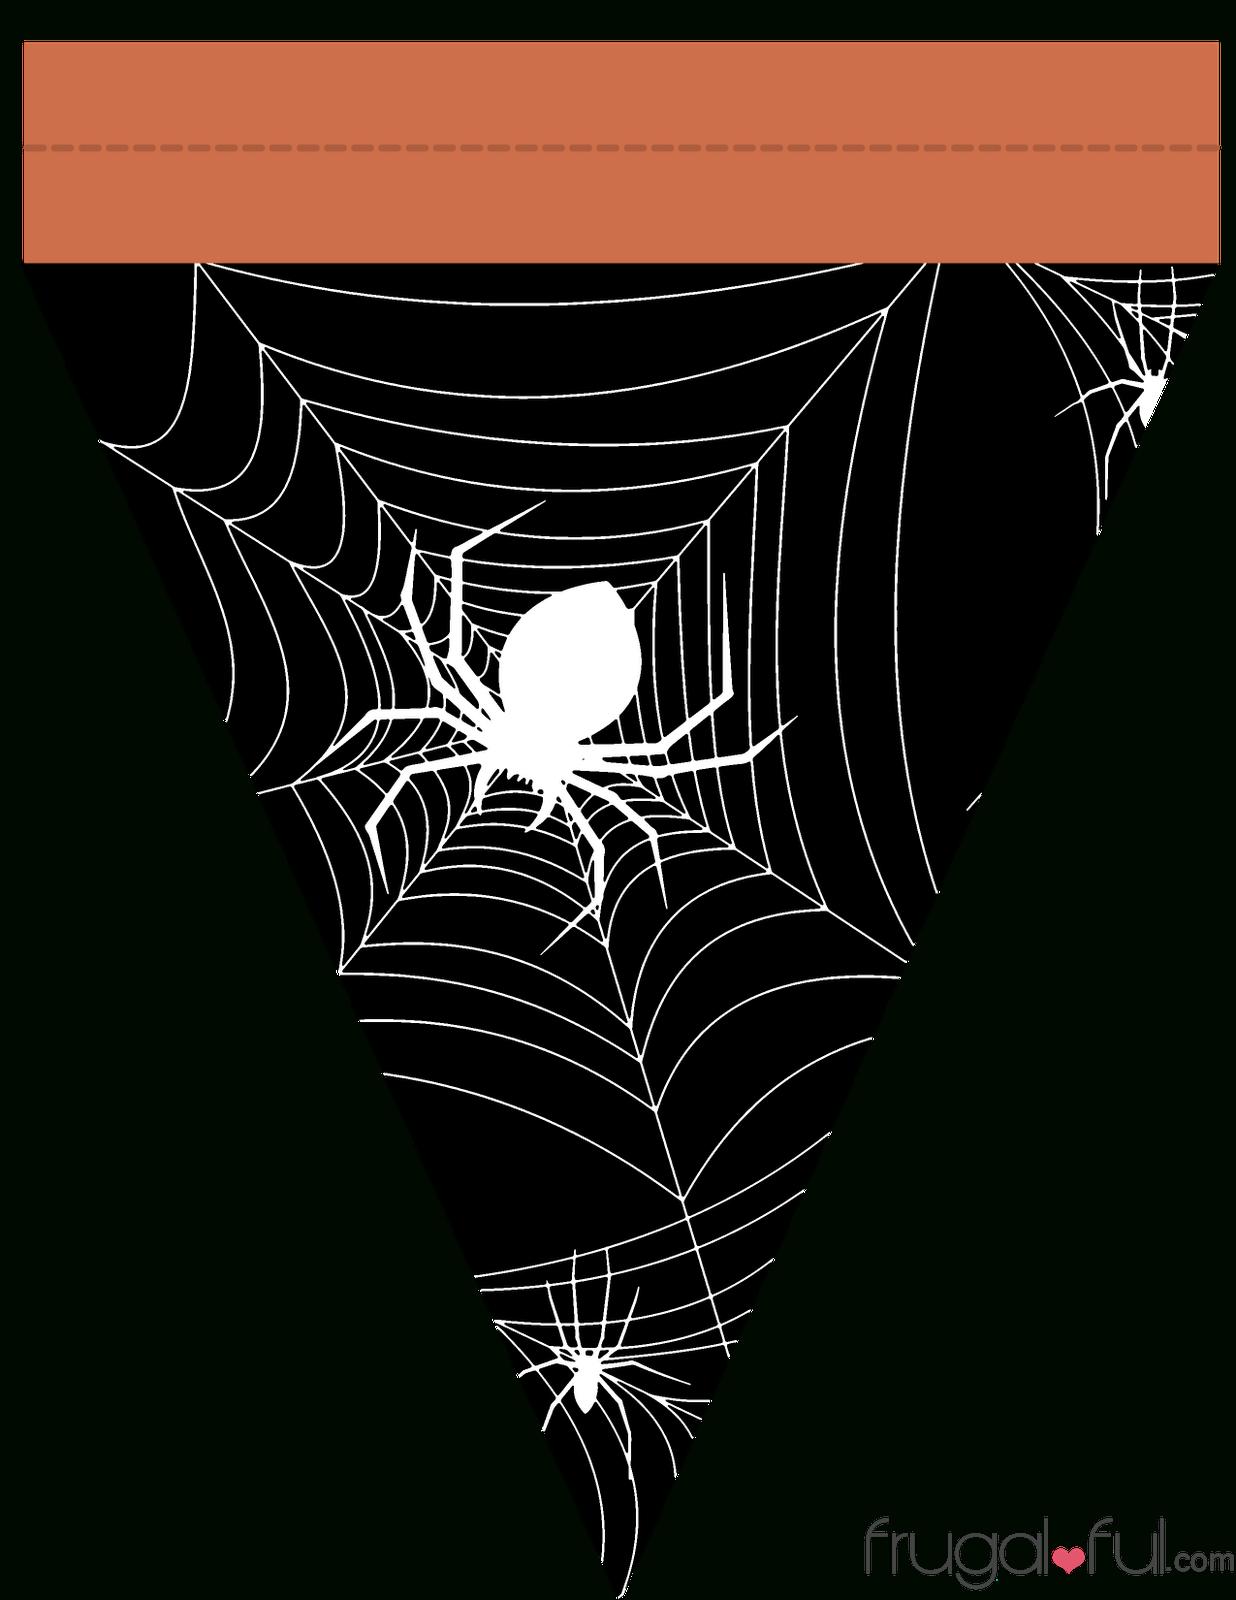 Diy} Free Printable Halloween Triangle Banner Template | Frugalful 2.0 - Free Printable Halloween Banner Templates